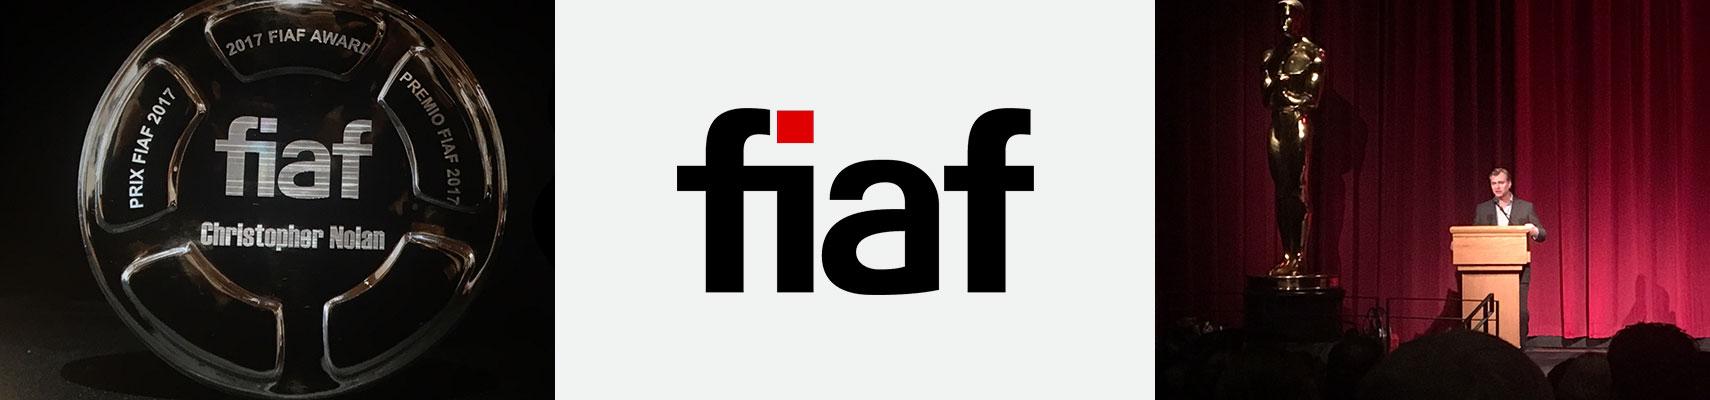 actu_fiaf2017